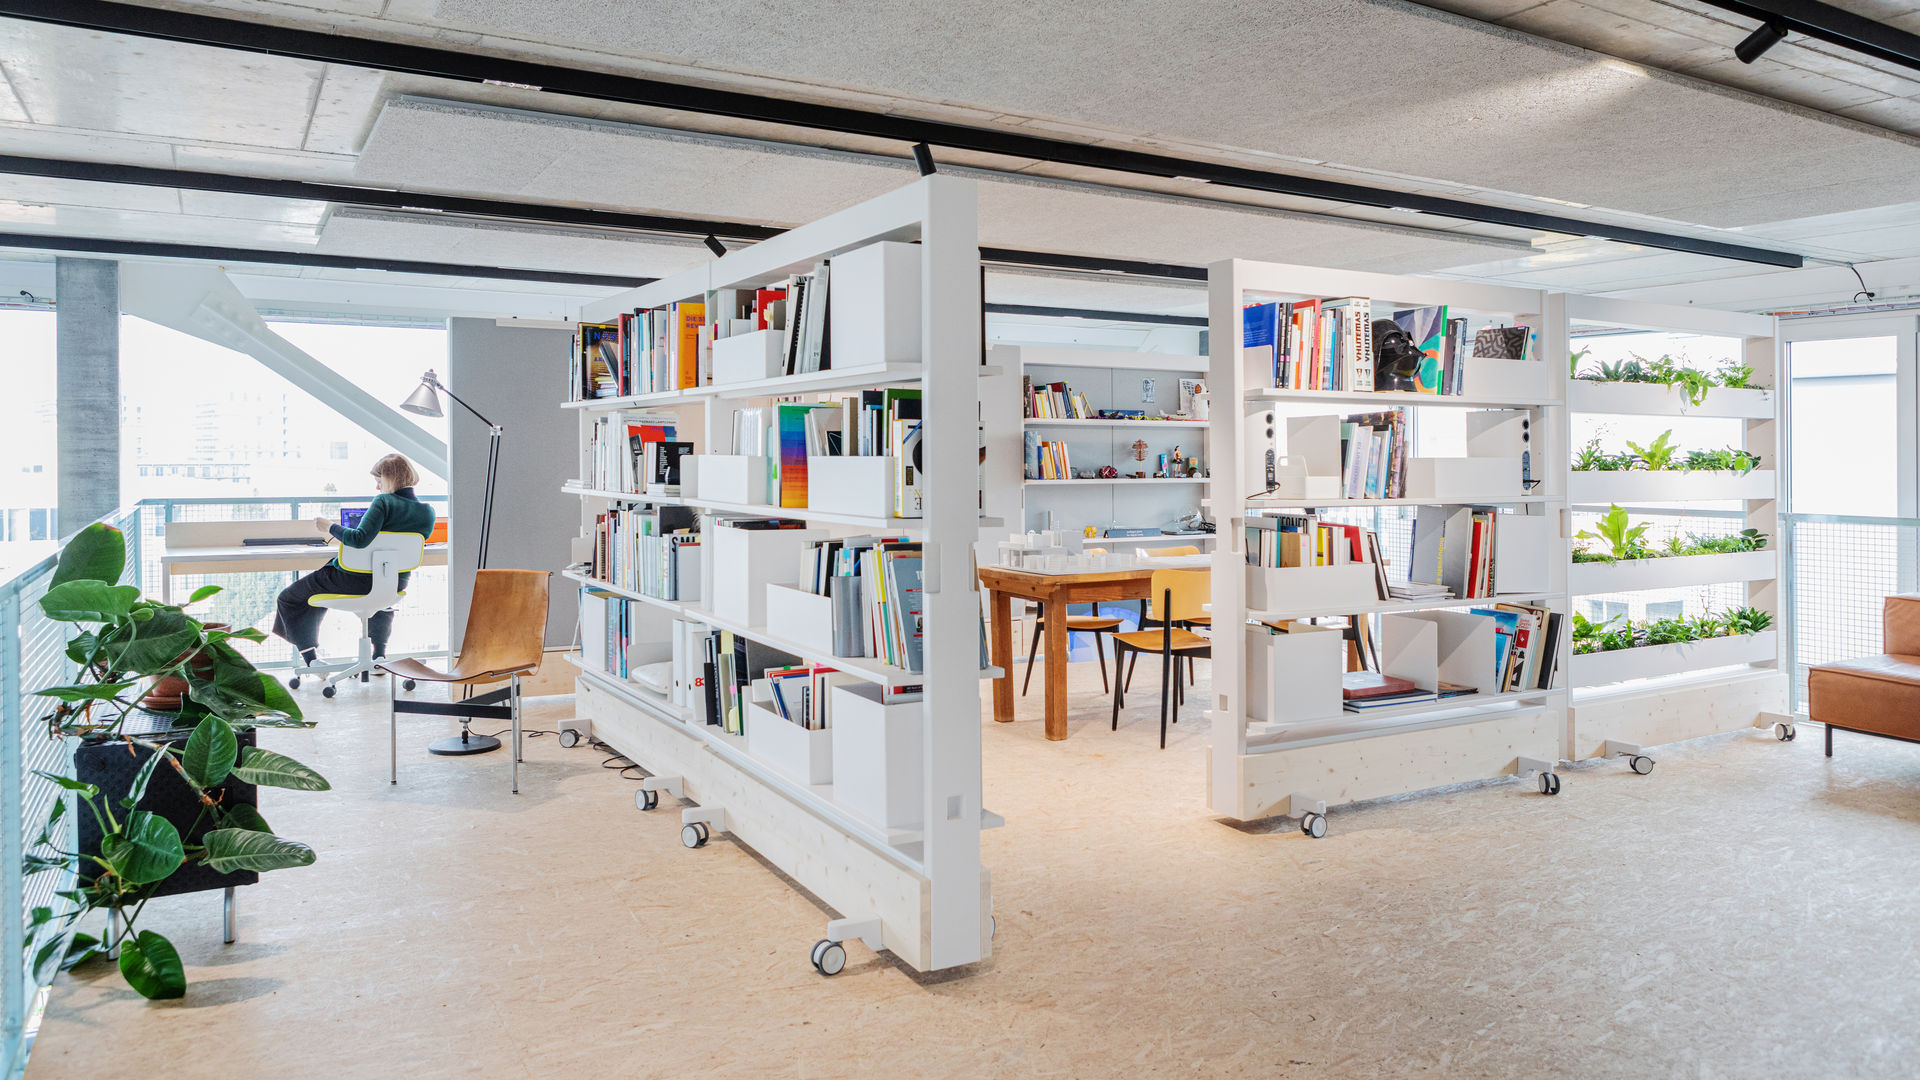 Studio Hürlemann New Office_2311_web_16-9